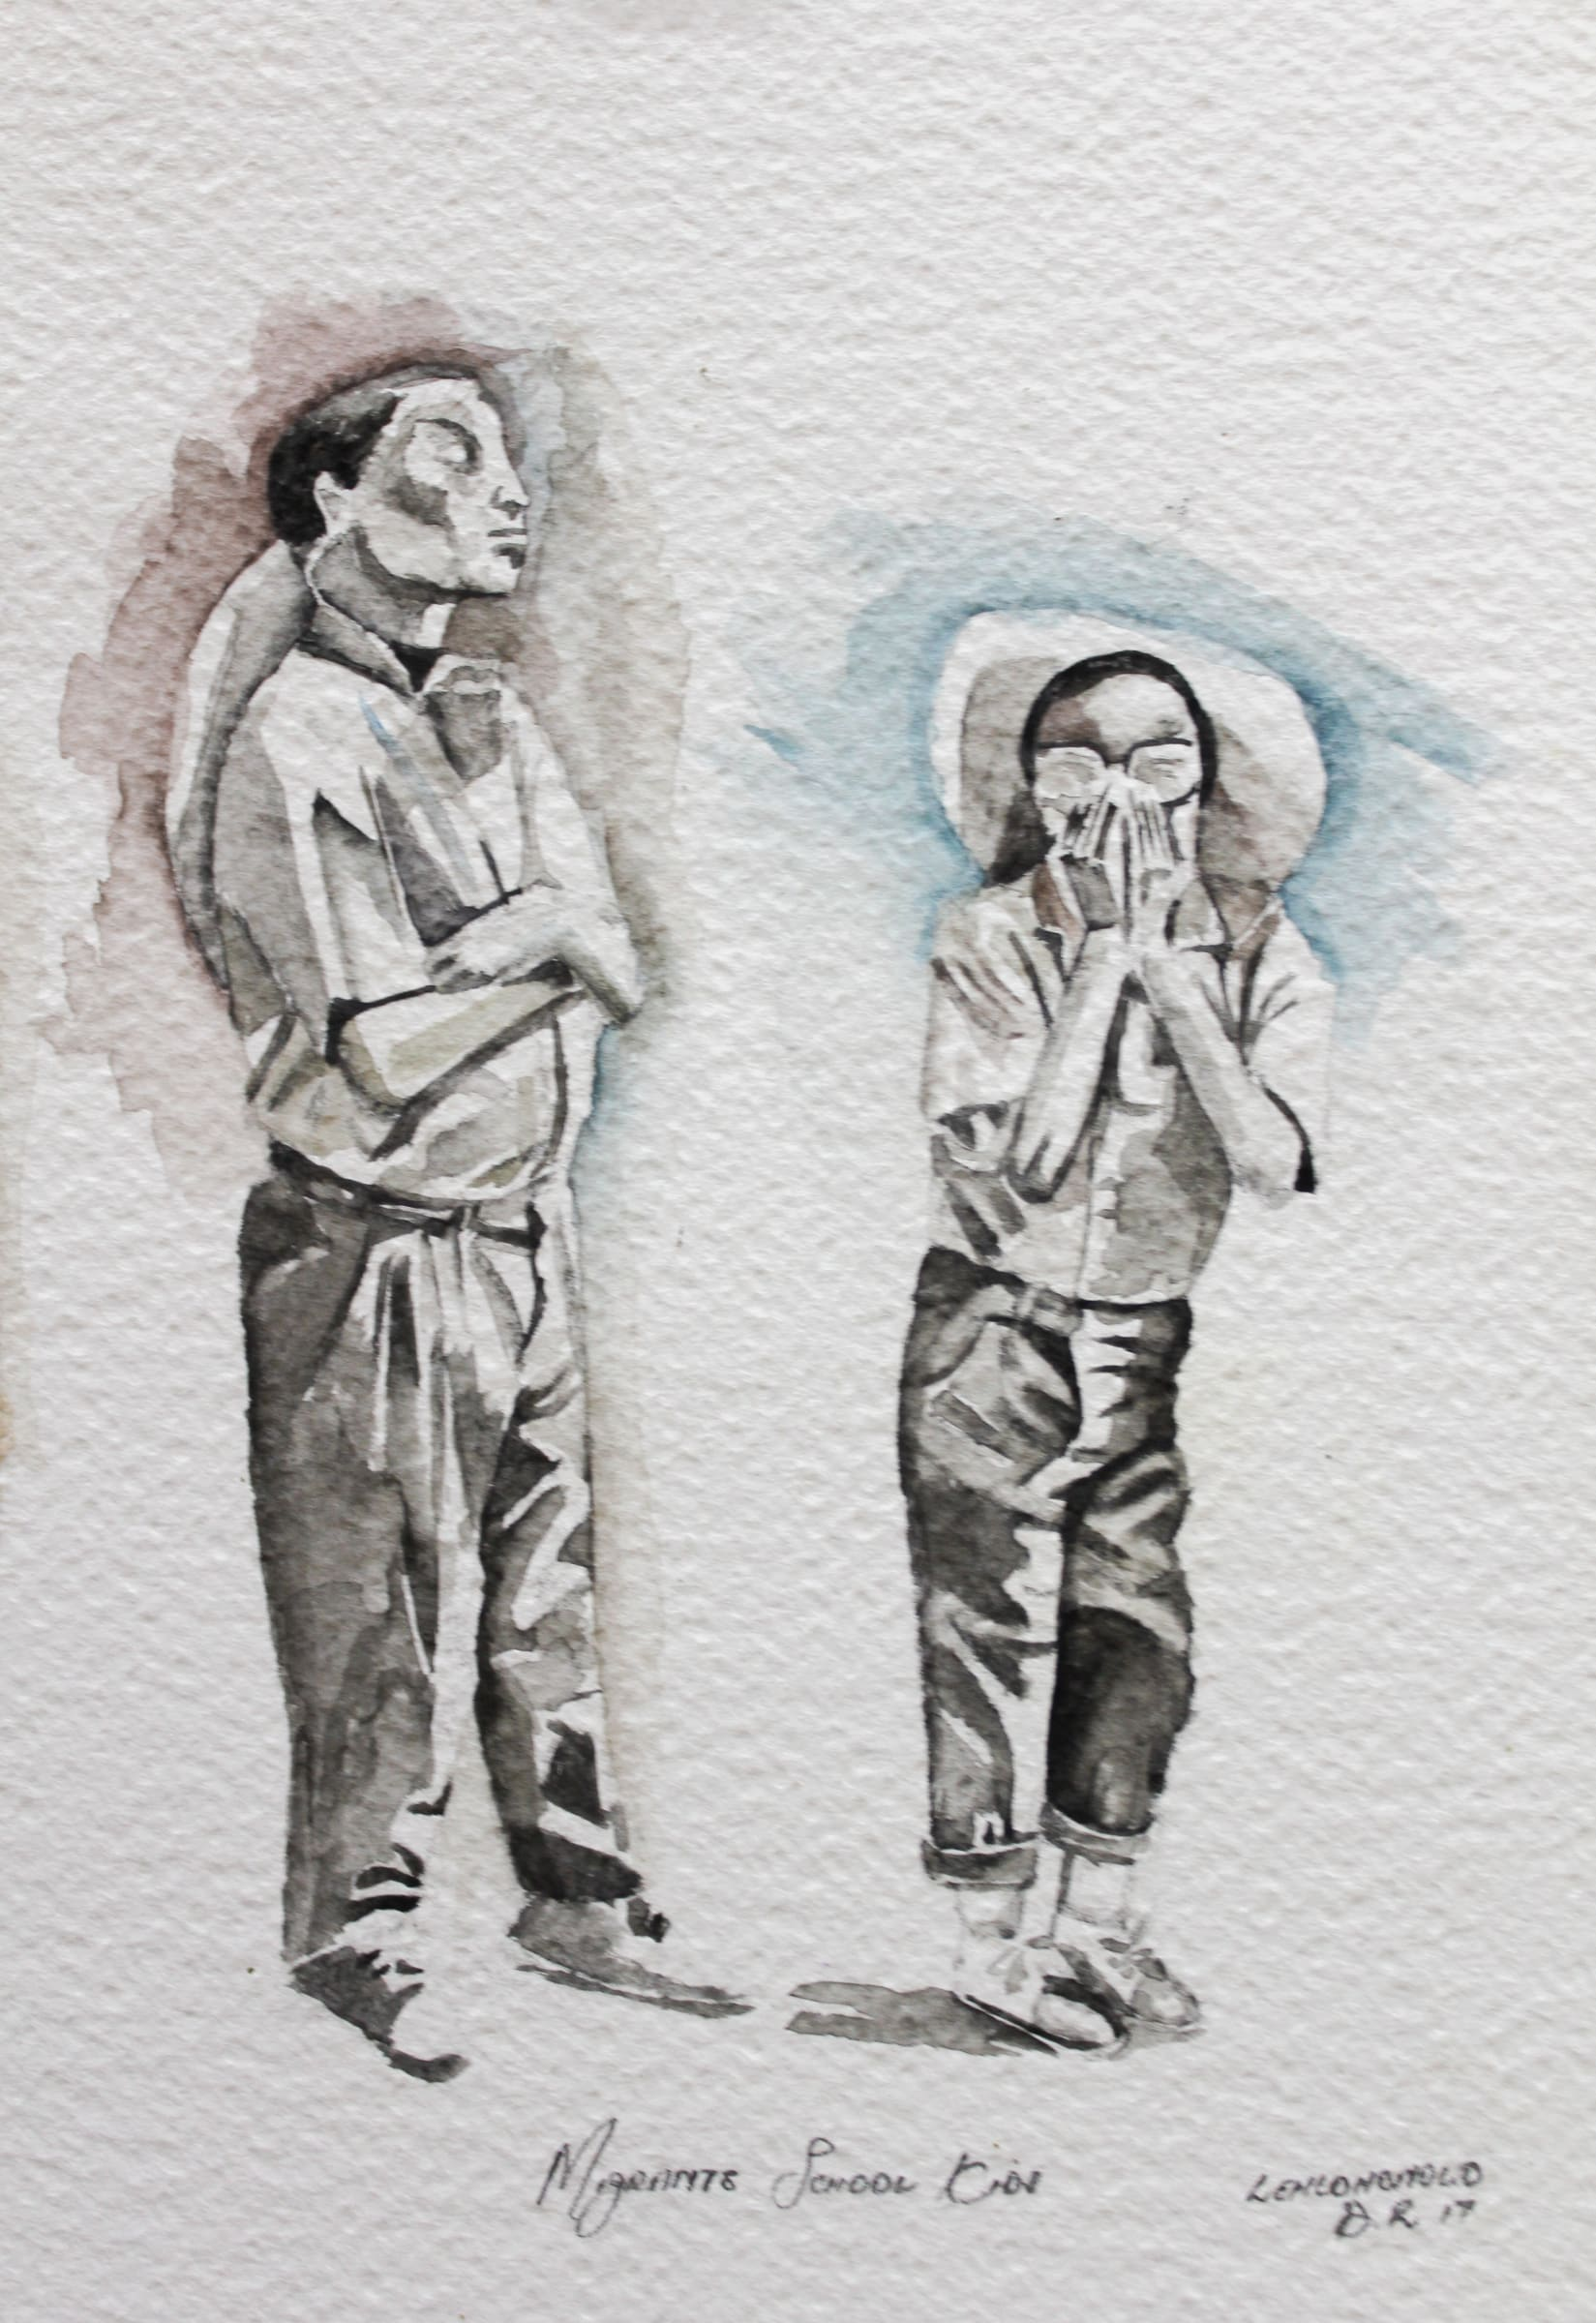 <span class=&#34;link fancybox-details-link&#34;><a href=&#34;/artists/34-lehlohonolo-dhlamini/works/1464-lehlohonolo-dhlamini-migrants-school-kids-2017/&#34;>View Detail Page</a></span><div class=&#34;artist&#34;><strong>Lehlohonolo Dhlamini</strong></div> <div class=&#34;title&#34;><em>Migrants School Kids</em>, 2017</div> <div class=&#34;medium&#34;>Watercolour On Paper</div> <div class=&#34;dimensions&#34;>25cm x 17cm</div><div class=&#34;price&#34;>R840.00</div>